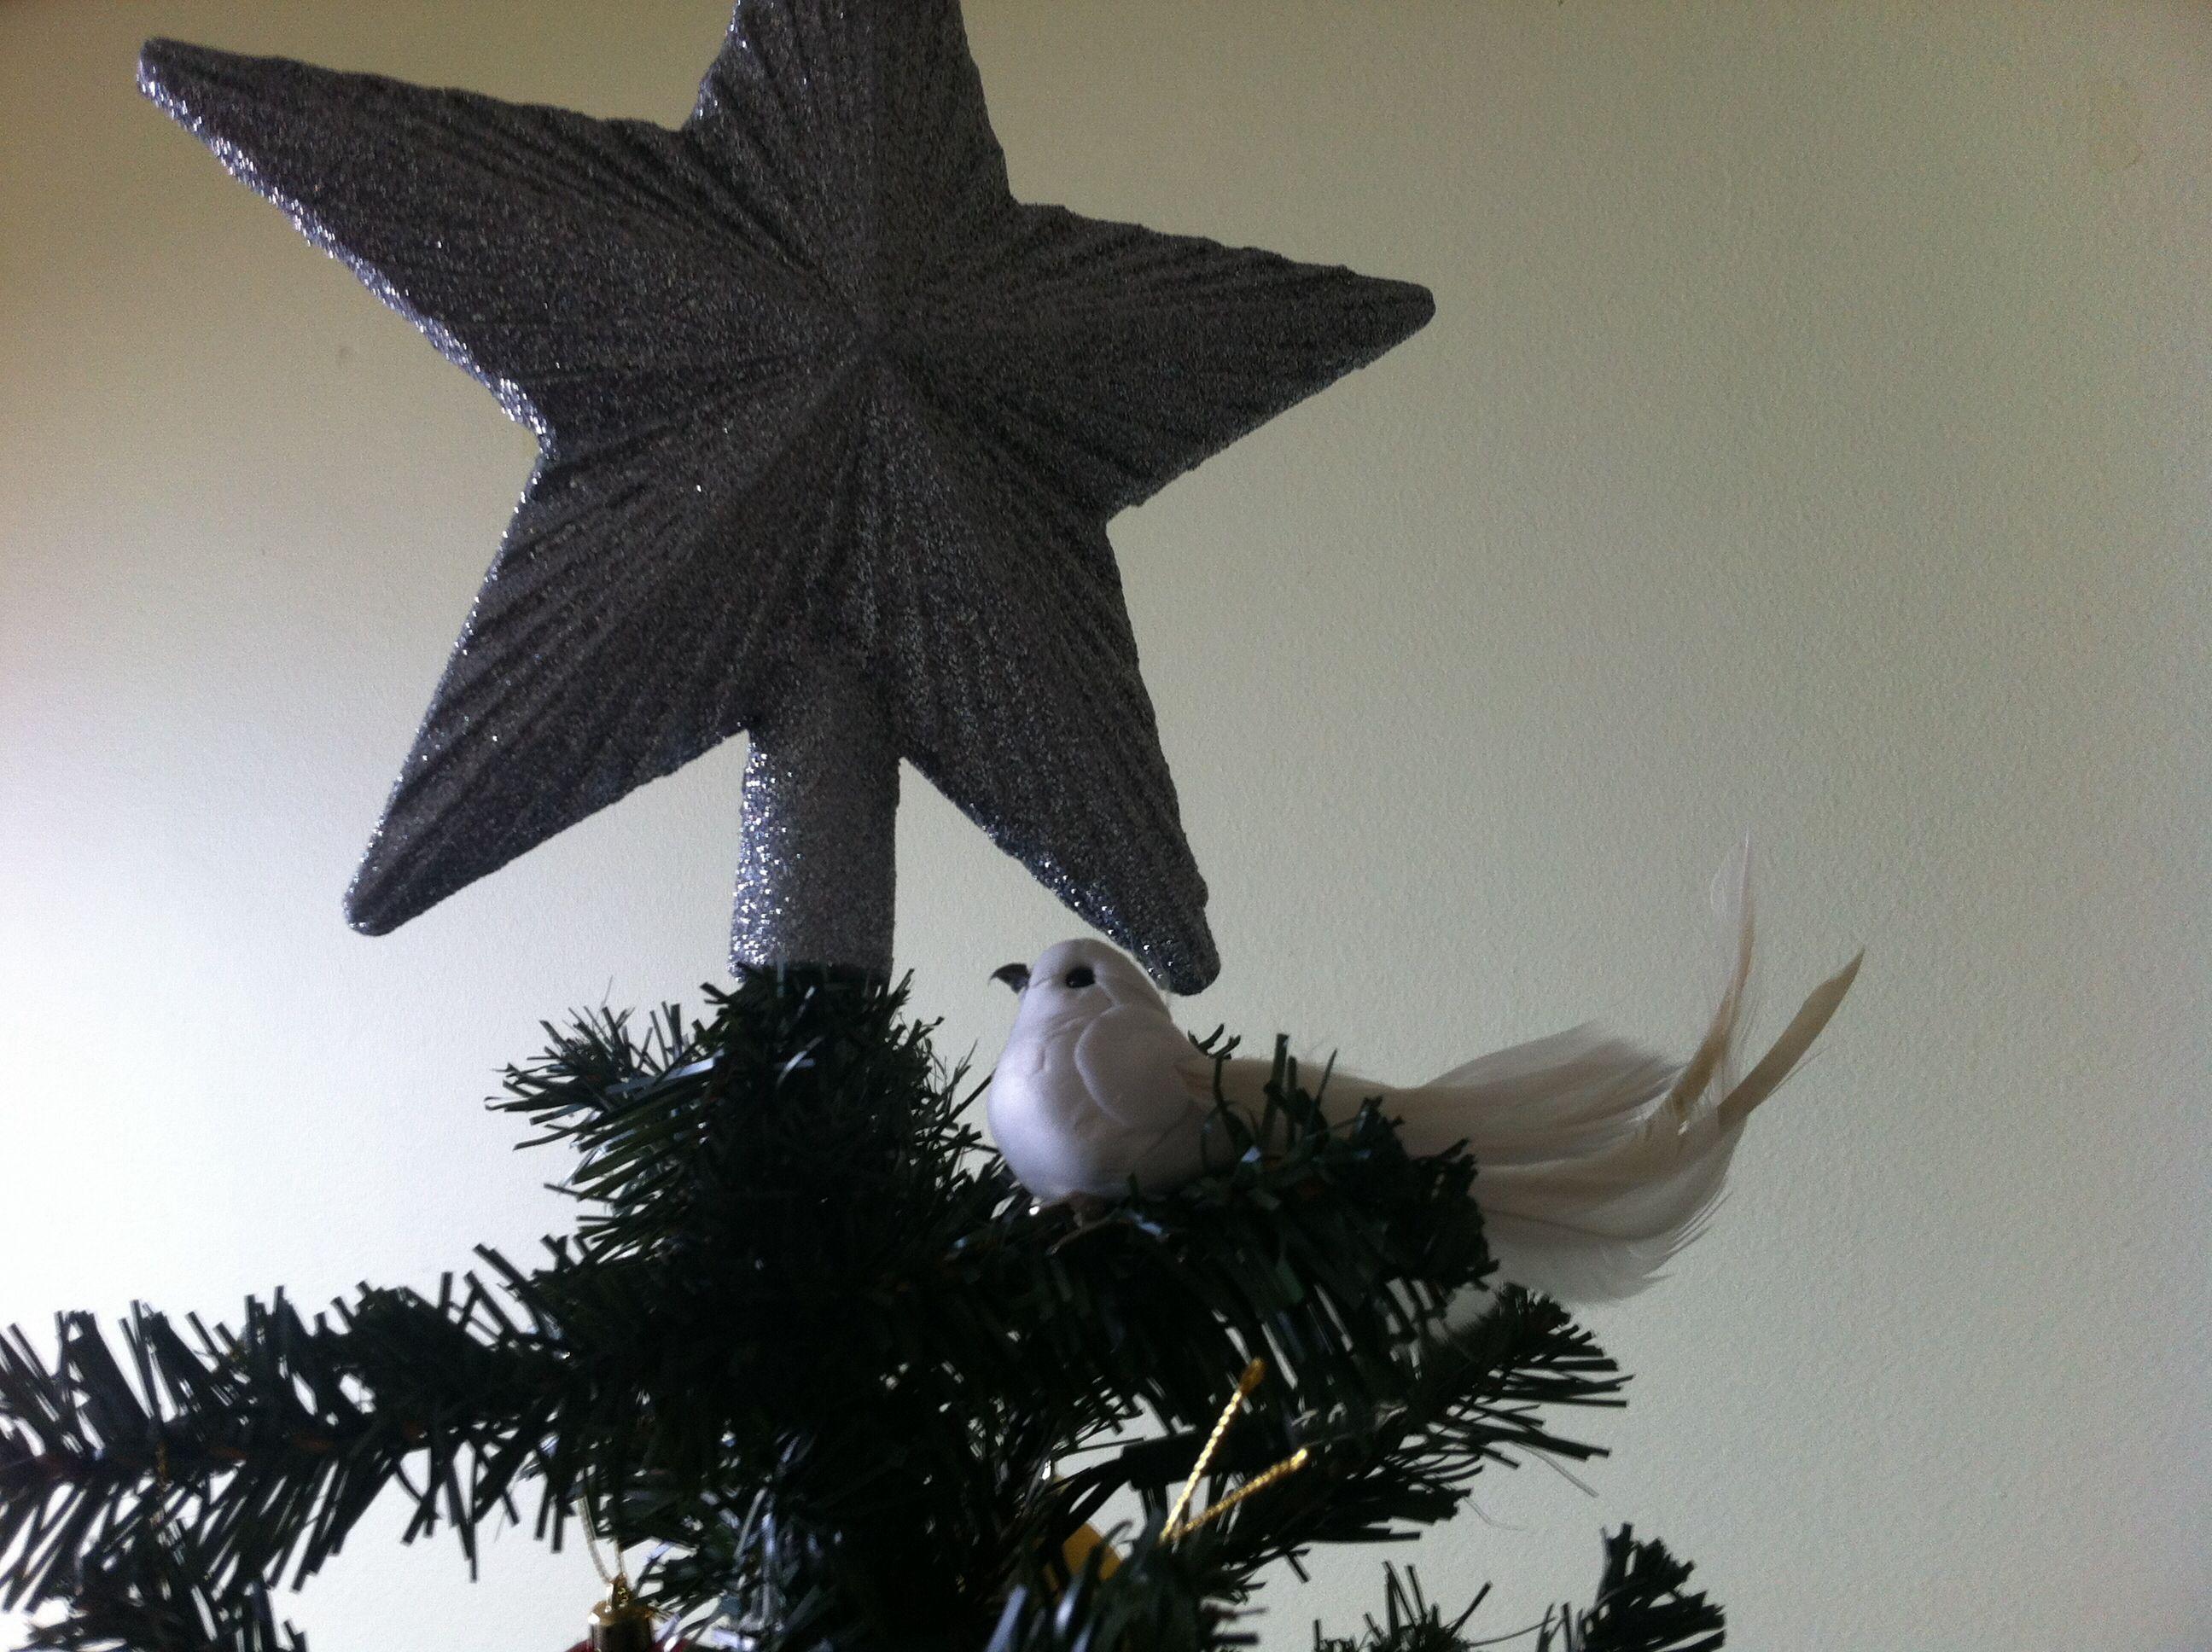 White bird in the christmas tree